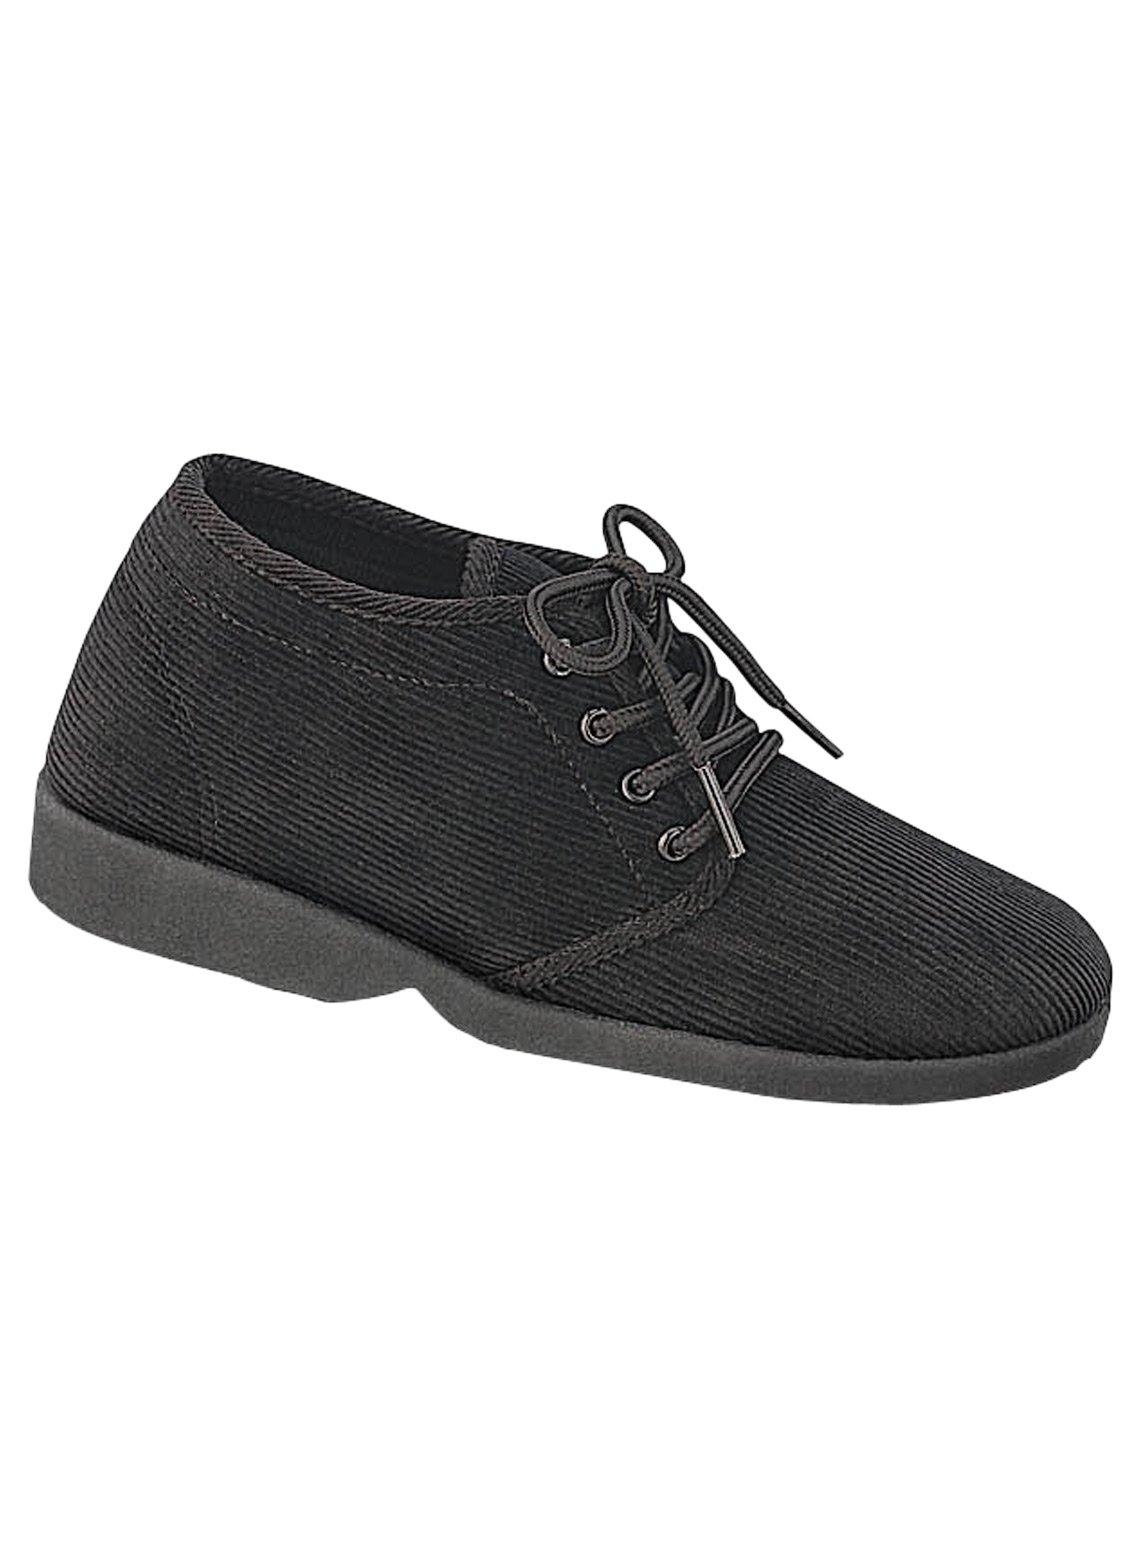 Carol Wright Gifts Corduroy Booties, Color Black, Size 9 (Medium), Black, Size 9 (Medium)